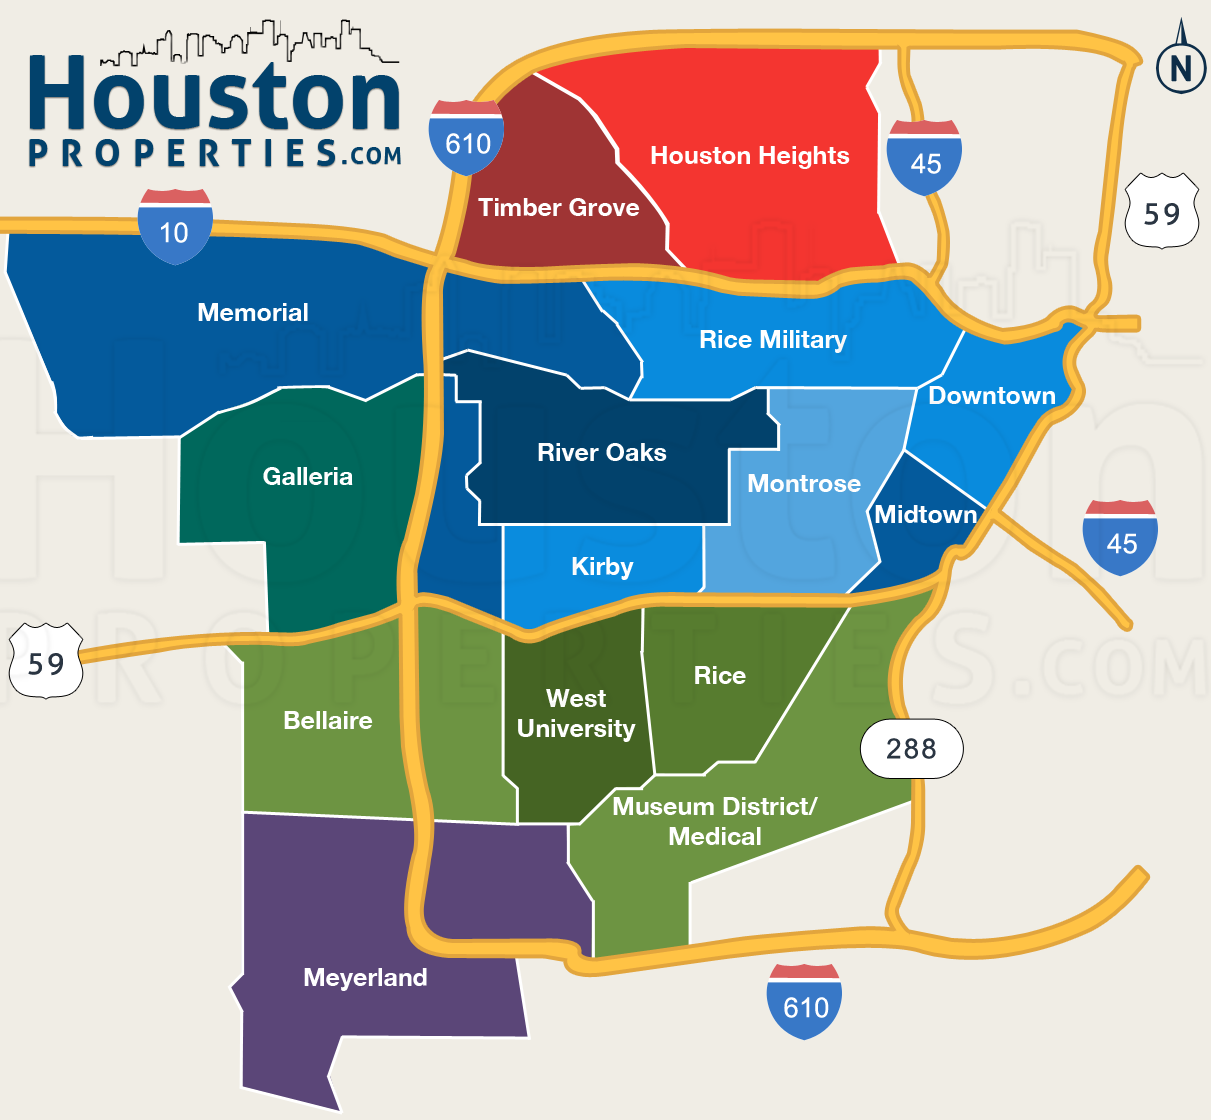 Great Map Of Houstonu0026#39;s Inner Loop Neighborhoods From Http//www.houstonproperties.com/houston ...